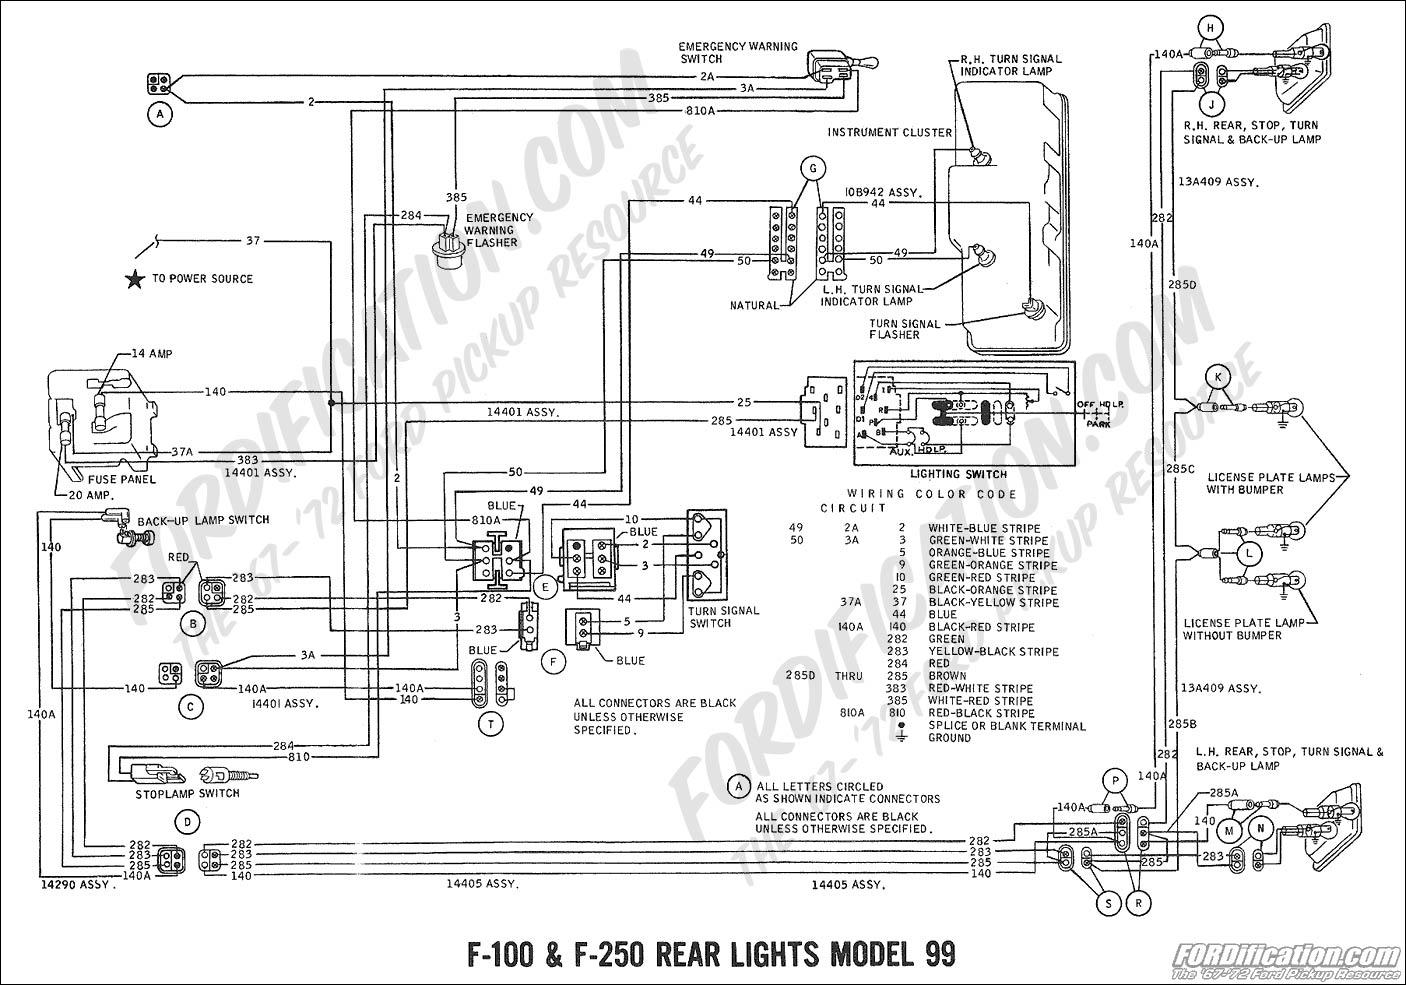 1973 triumph gt6 wiring diagram imageresizertool com triumph gt6 mk2 wiring diagram triumph gt6 mk2 wiring diagram